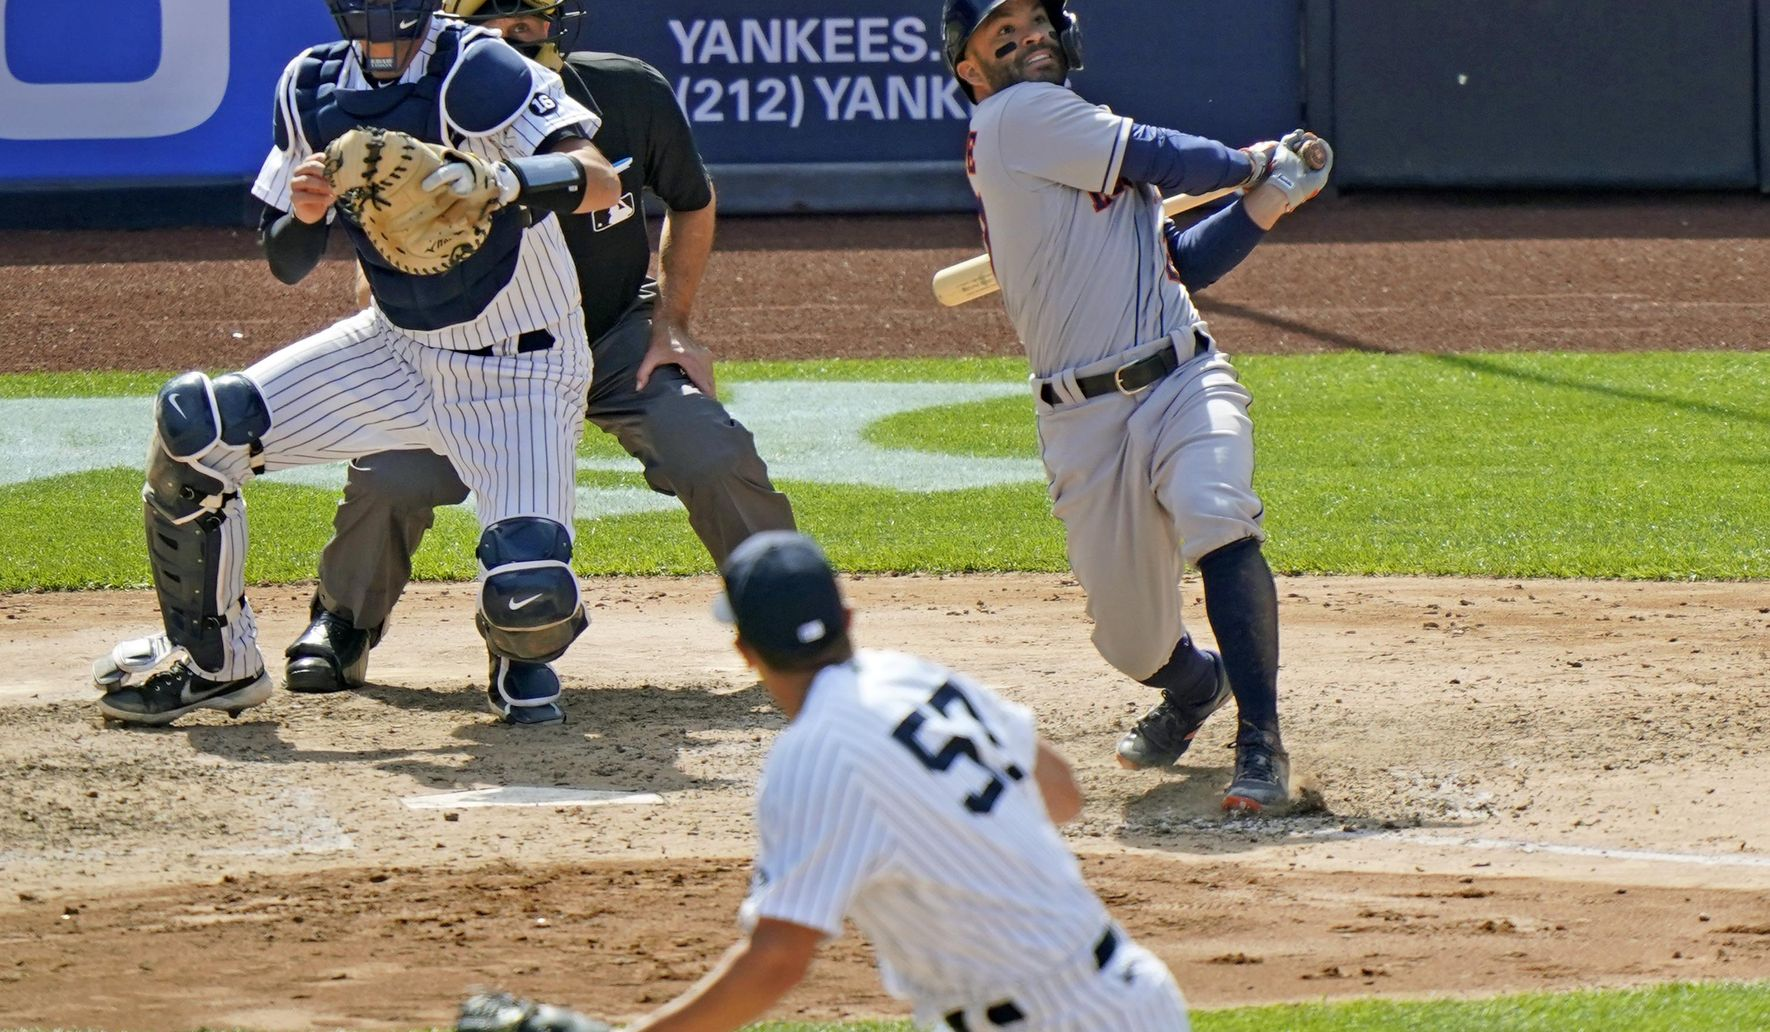 Astros_yankees_baseball_71473_c0-126-3017-1885_s1770x1032